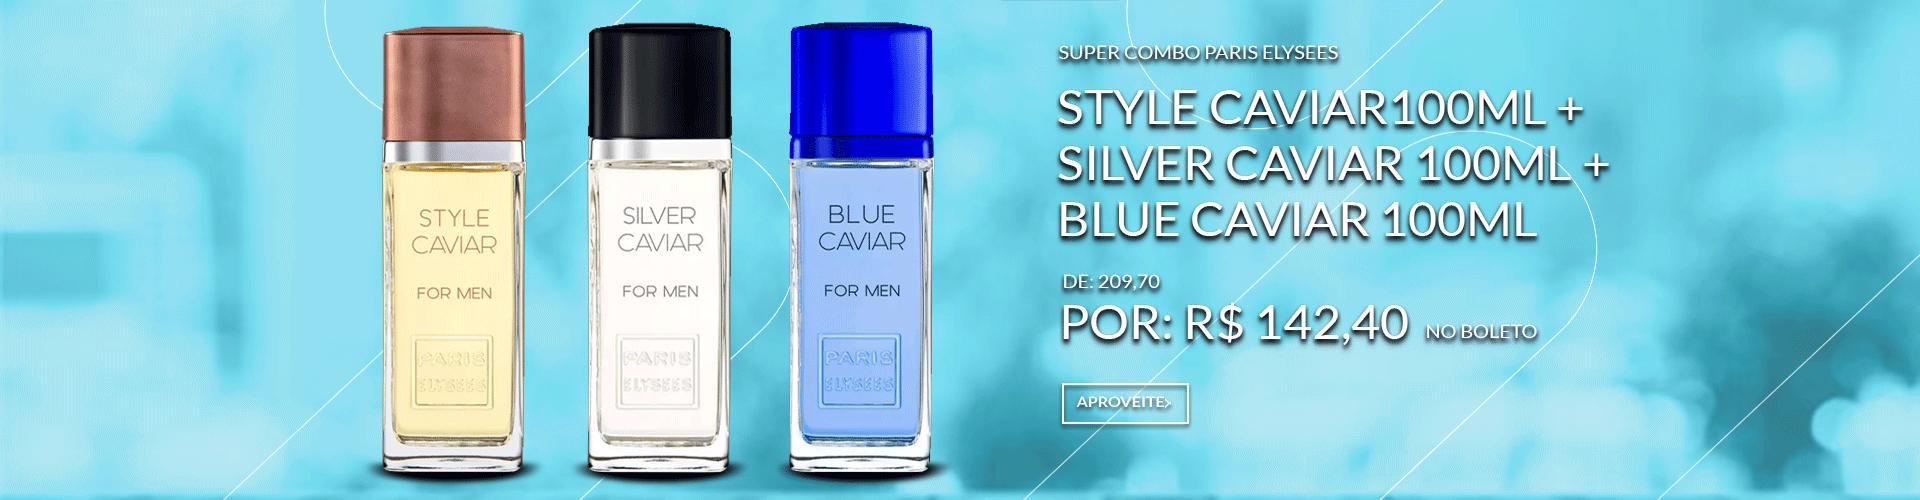 Combo Paris Elysees Style Caviar 100ml + Silver Caviar Caviar 100ml + Blue Caviar